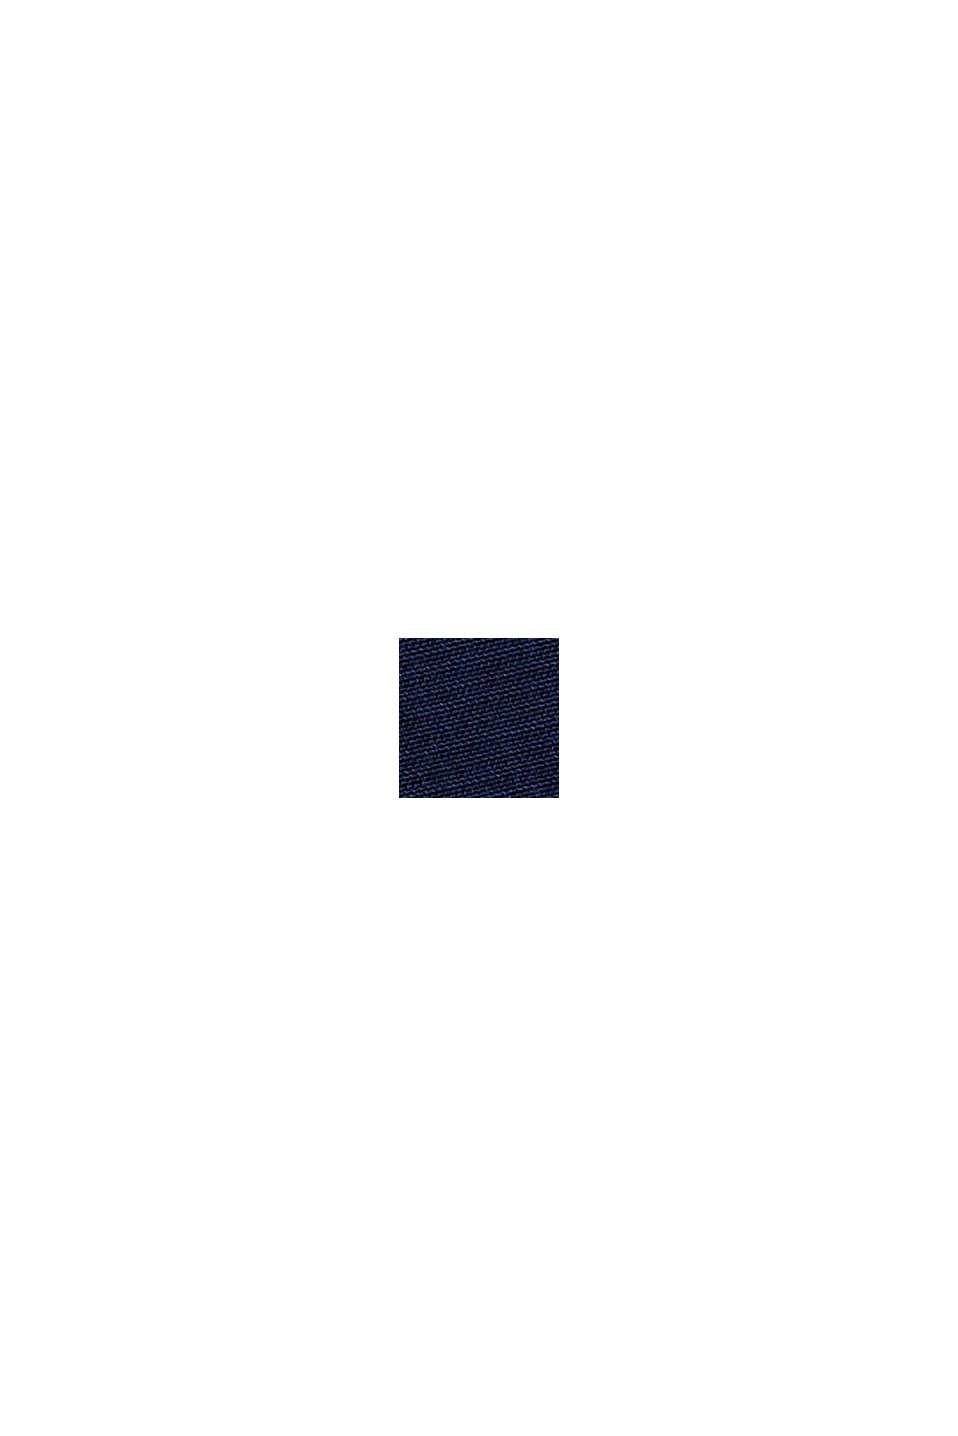 Blusenkleid mit Gürtel, LENZING™ ECOVERO™, NAVY, swatch